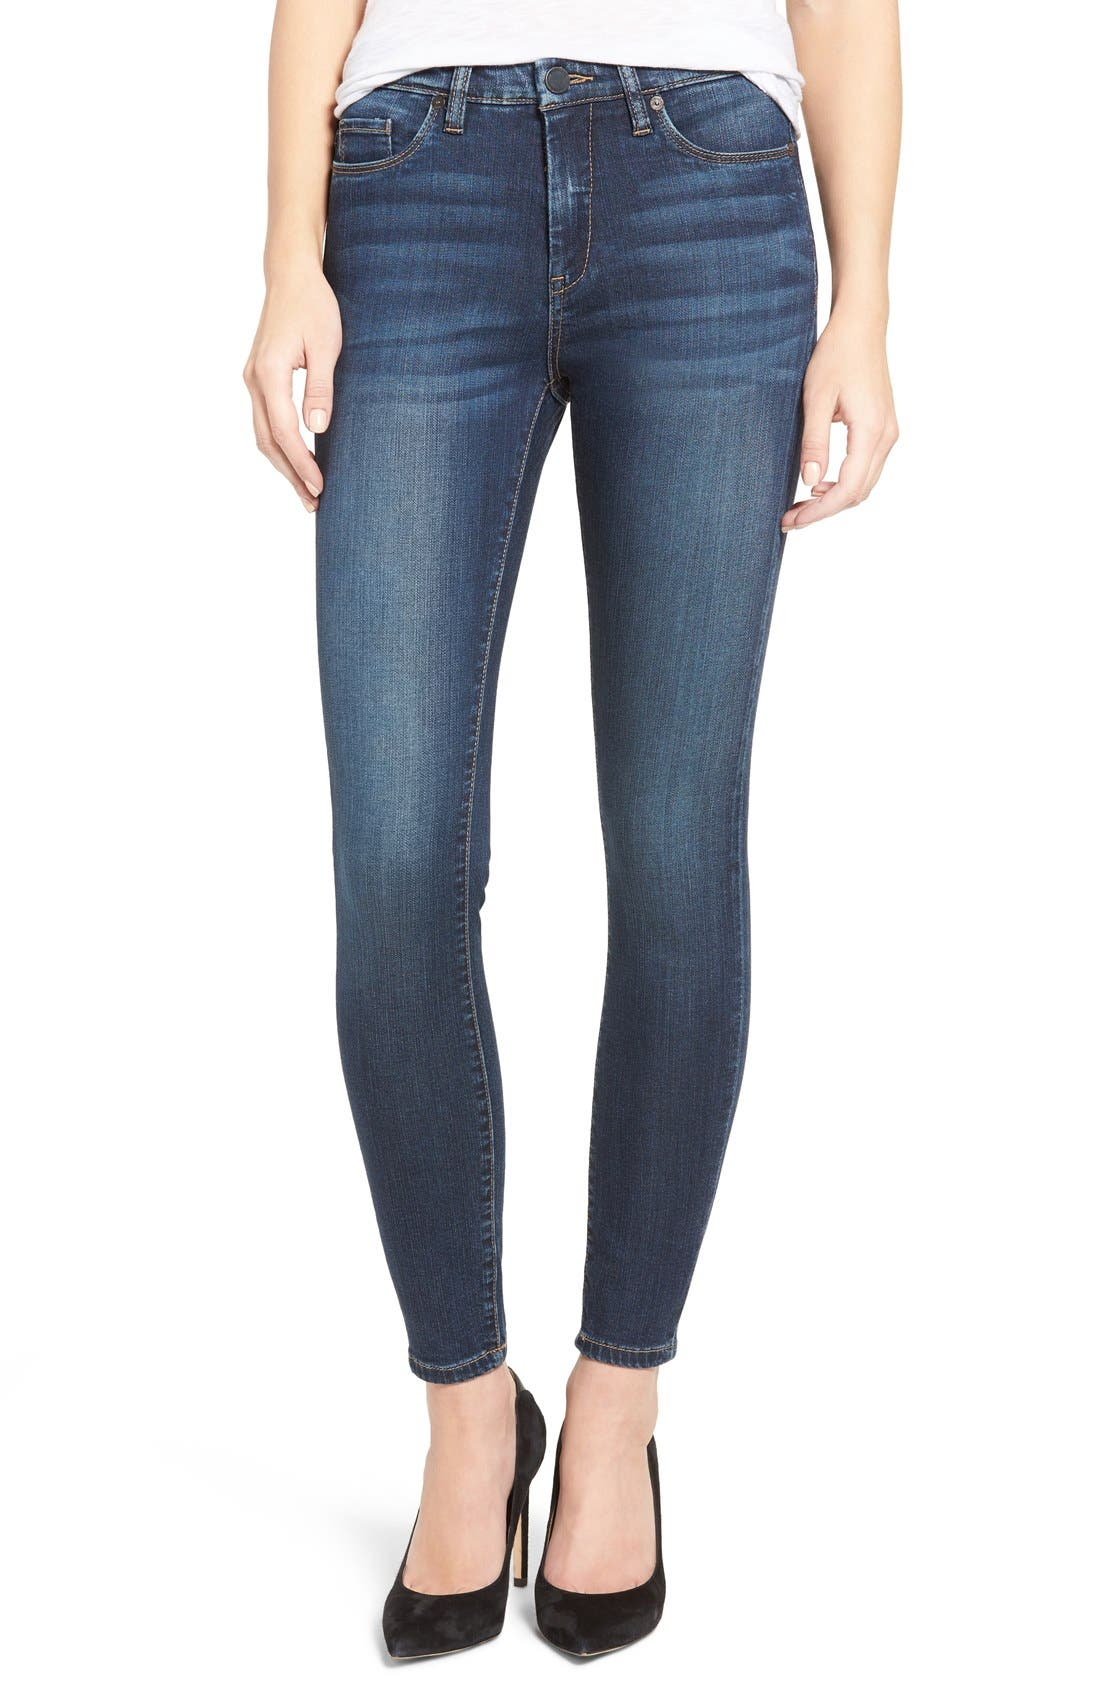 Alternate Image 1 Selected - BLANKNYC Skinny Jeans (The Real Feel)